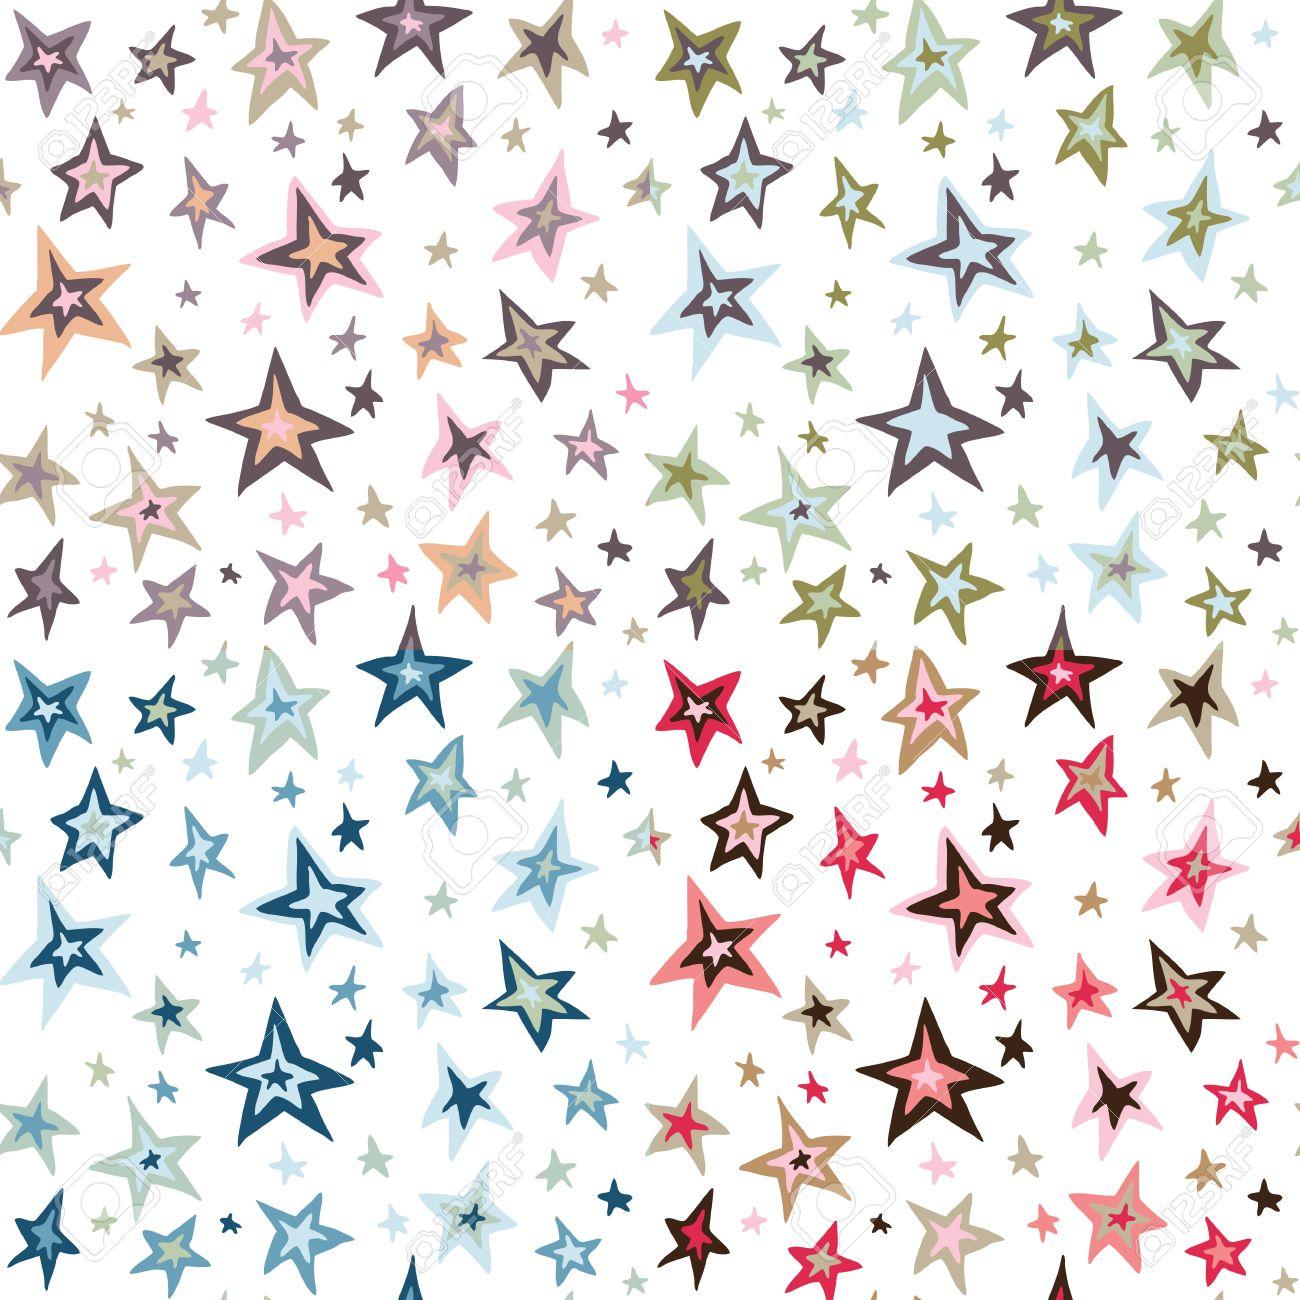 Vintage stars galleries 65